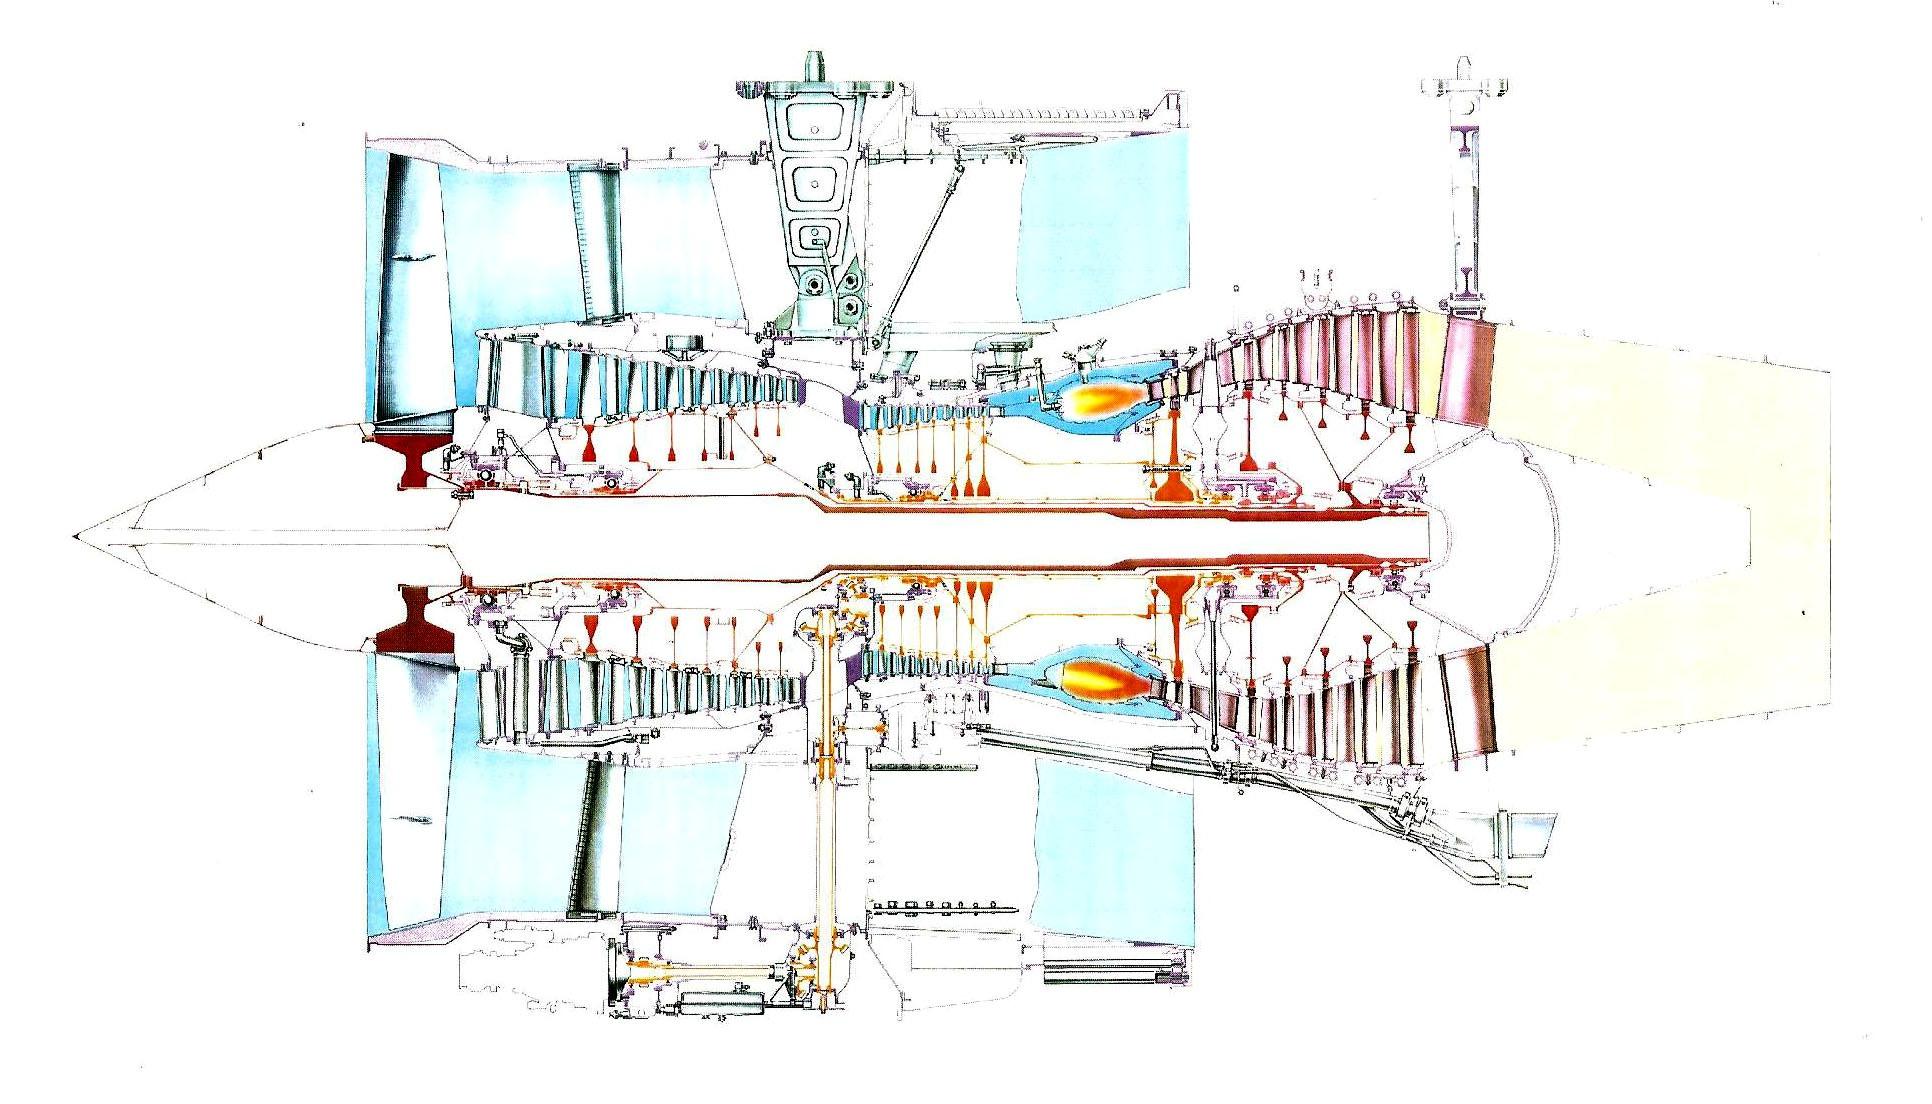 Antonov 225 Mriya Engine Old Gas Diagram Details Of The